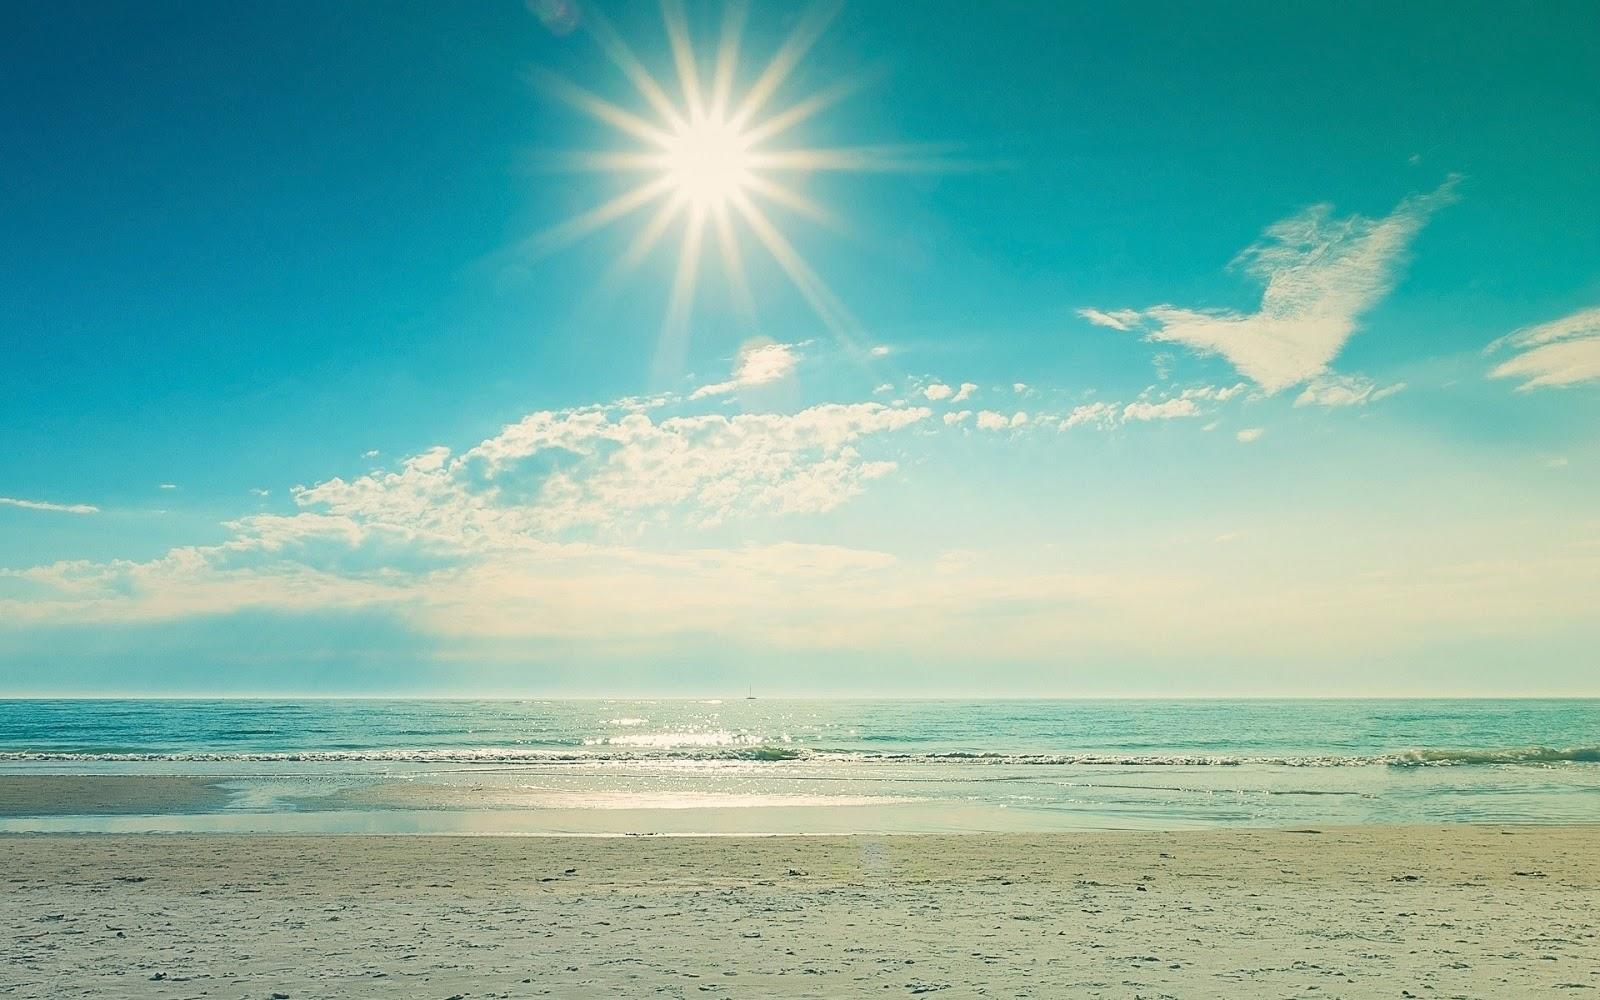 zomervakantie zon zee strand